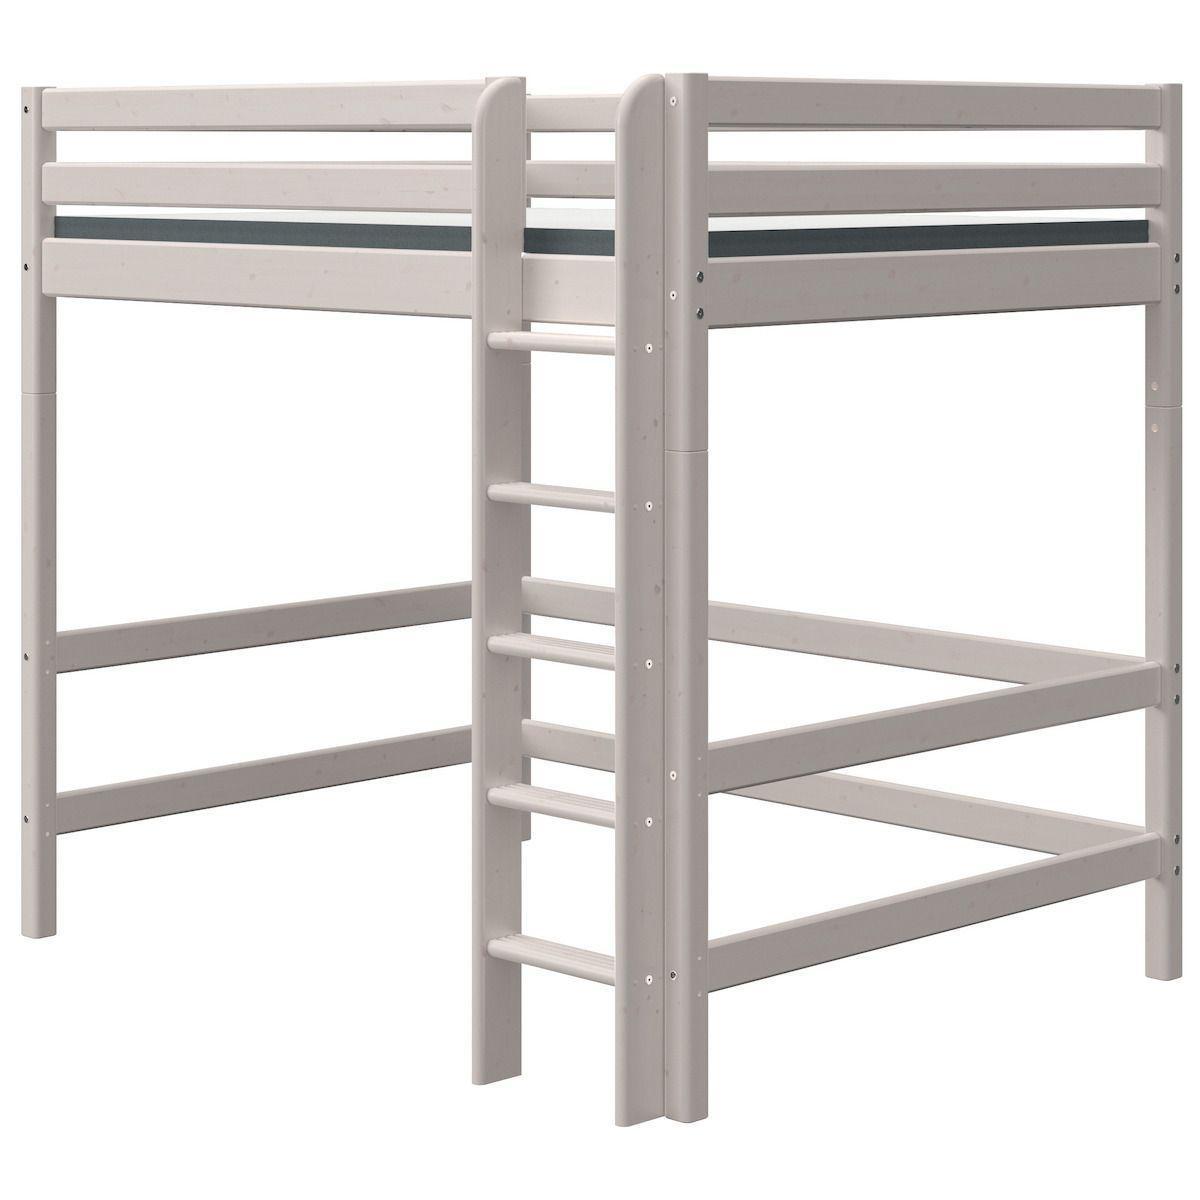 Cama alta 140x200cm escalera recta CLASSIC Flexa grey washed